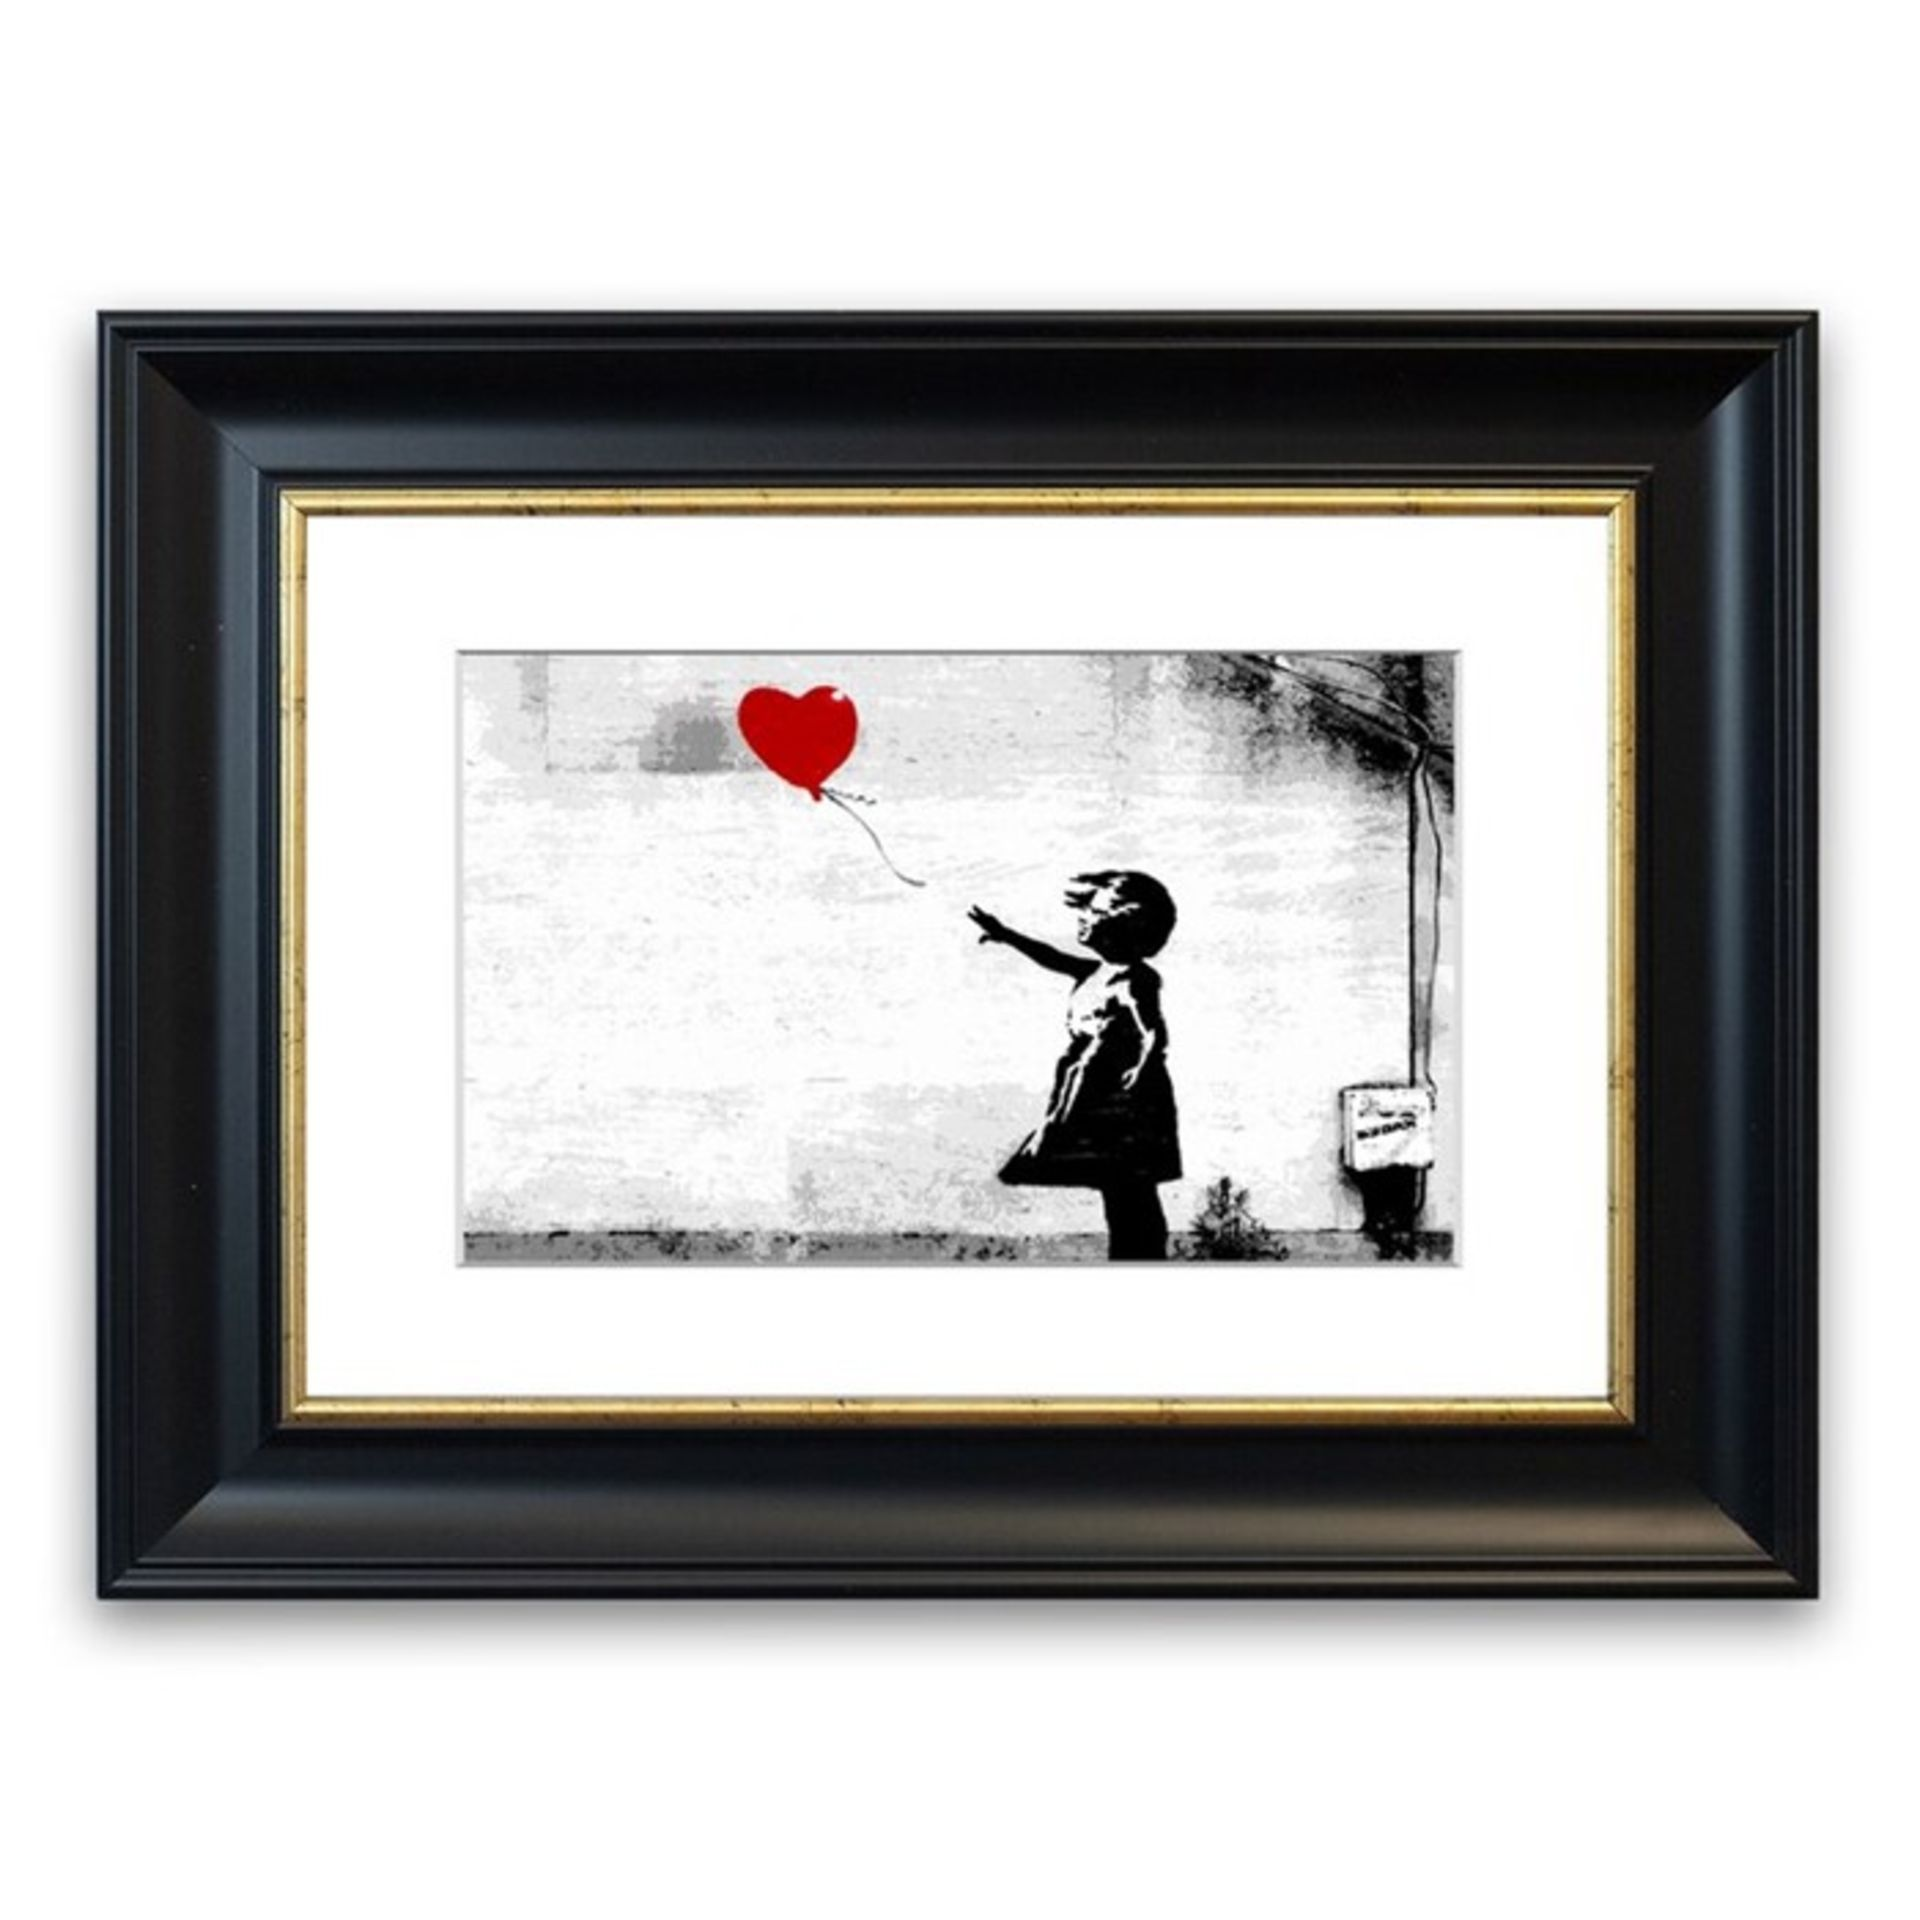 East Urban Home, Balloon Girl Love Heart Cornwall Banksy' Framed Photographic Print (93X126CM)(